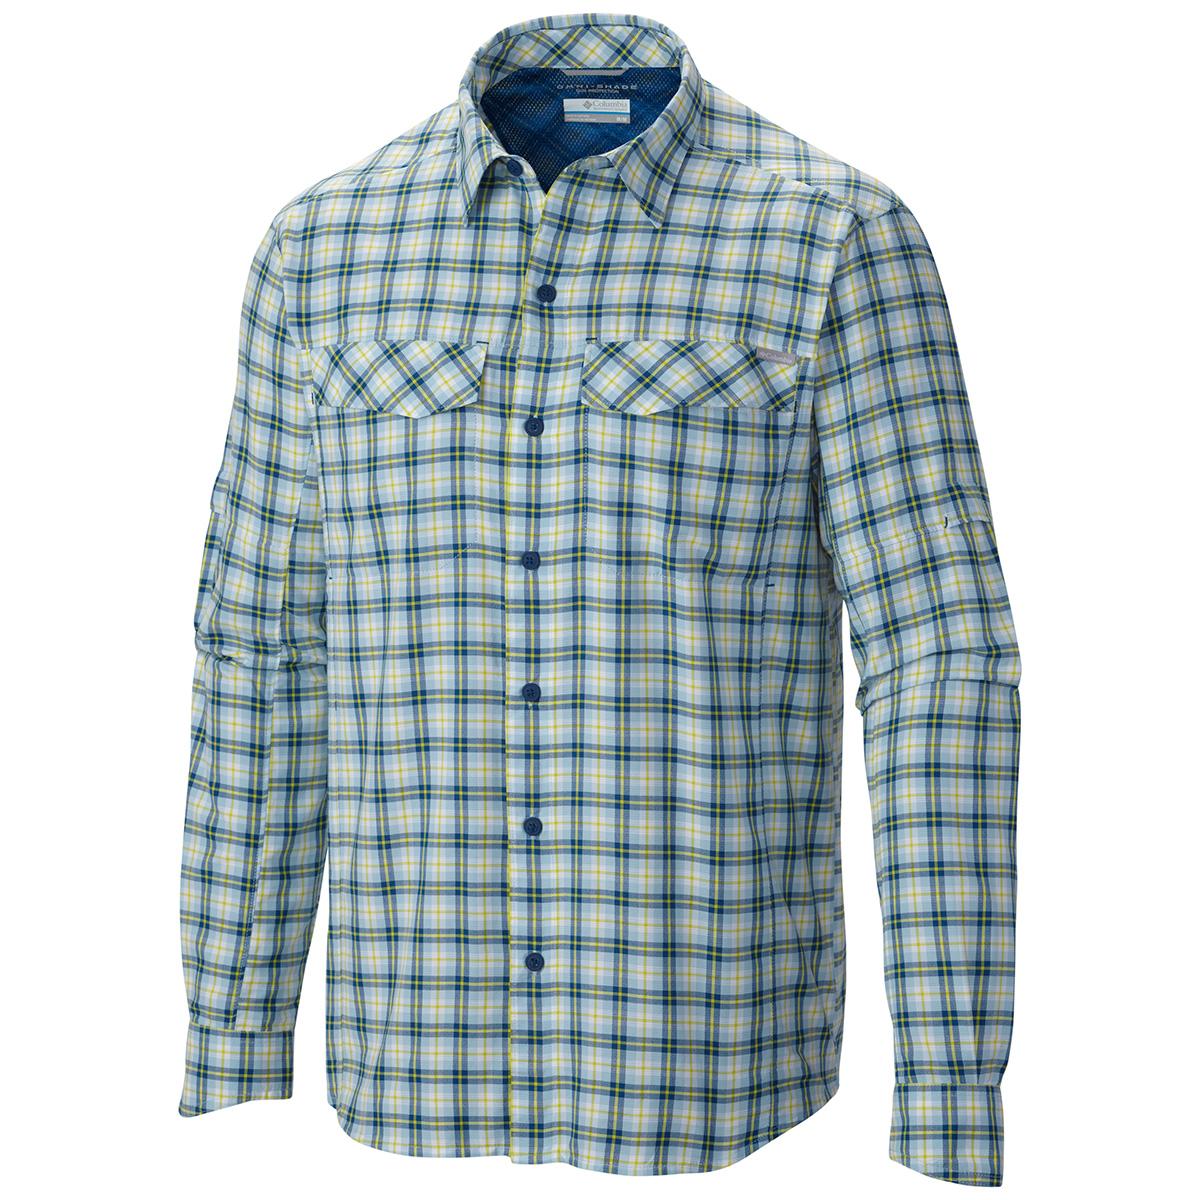 Columbia silver ridge plaid long sleeve shirt 2015 for Fishing long sleeve shirts